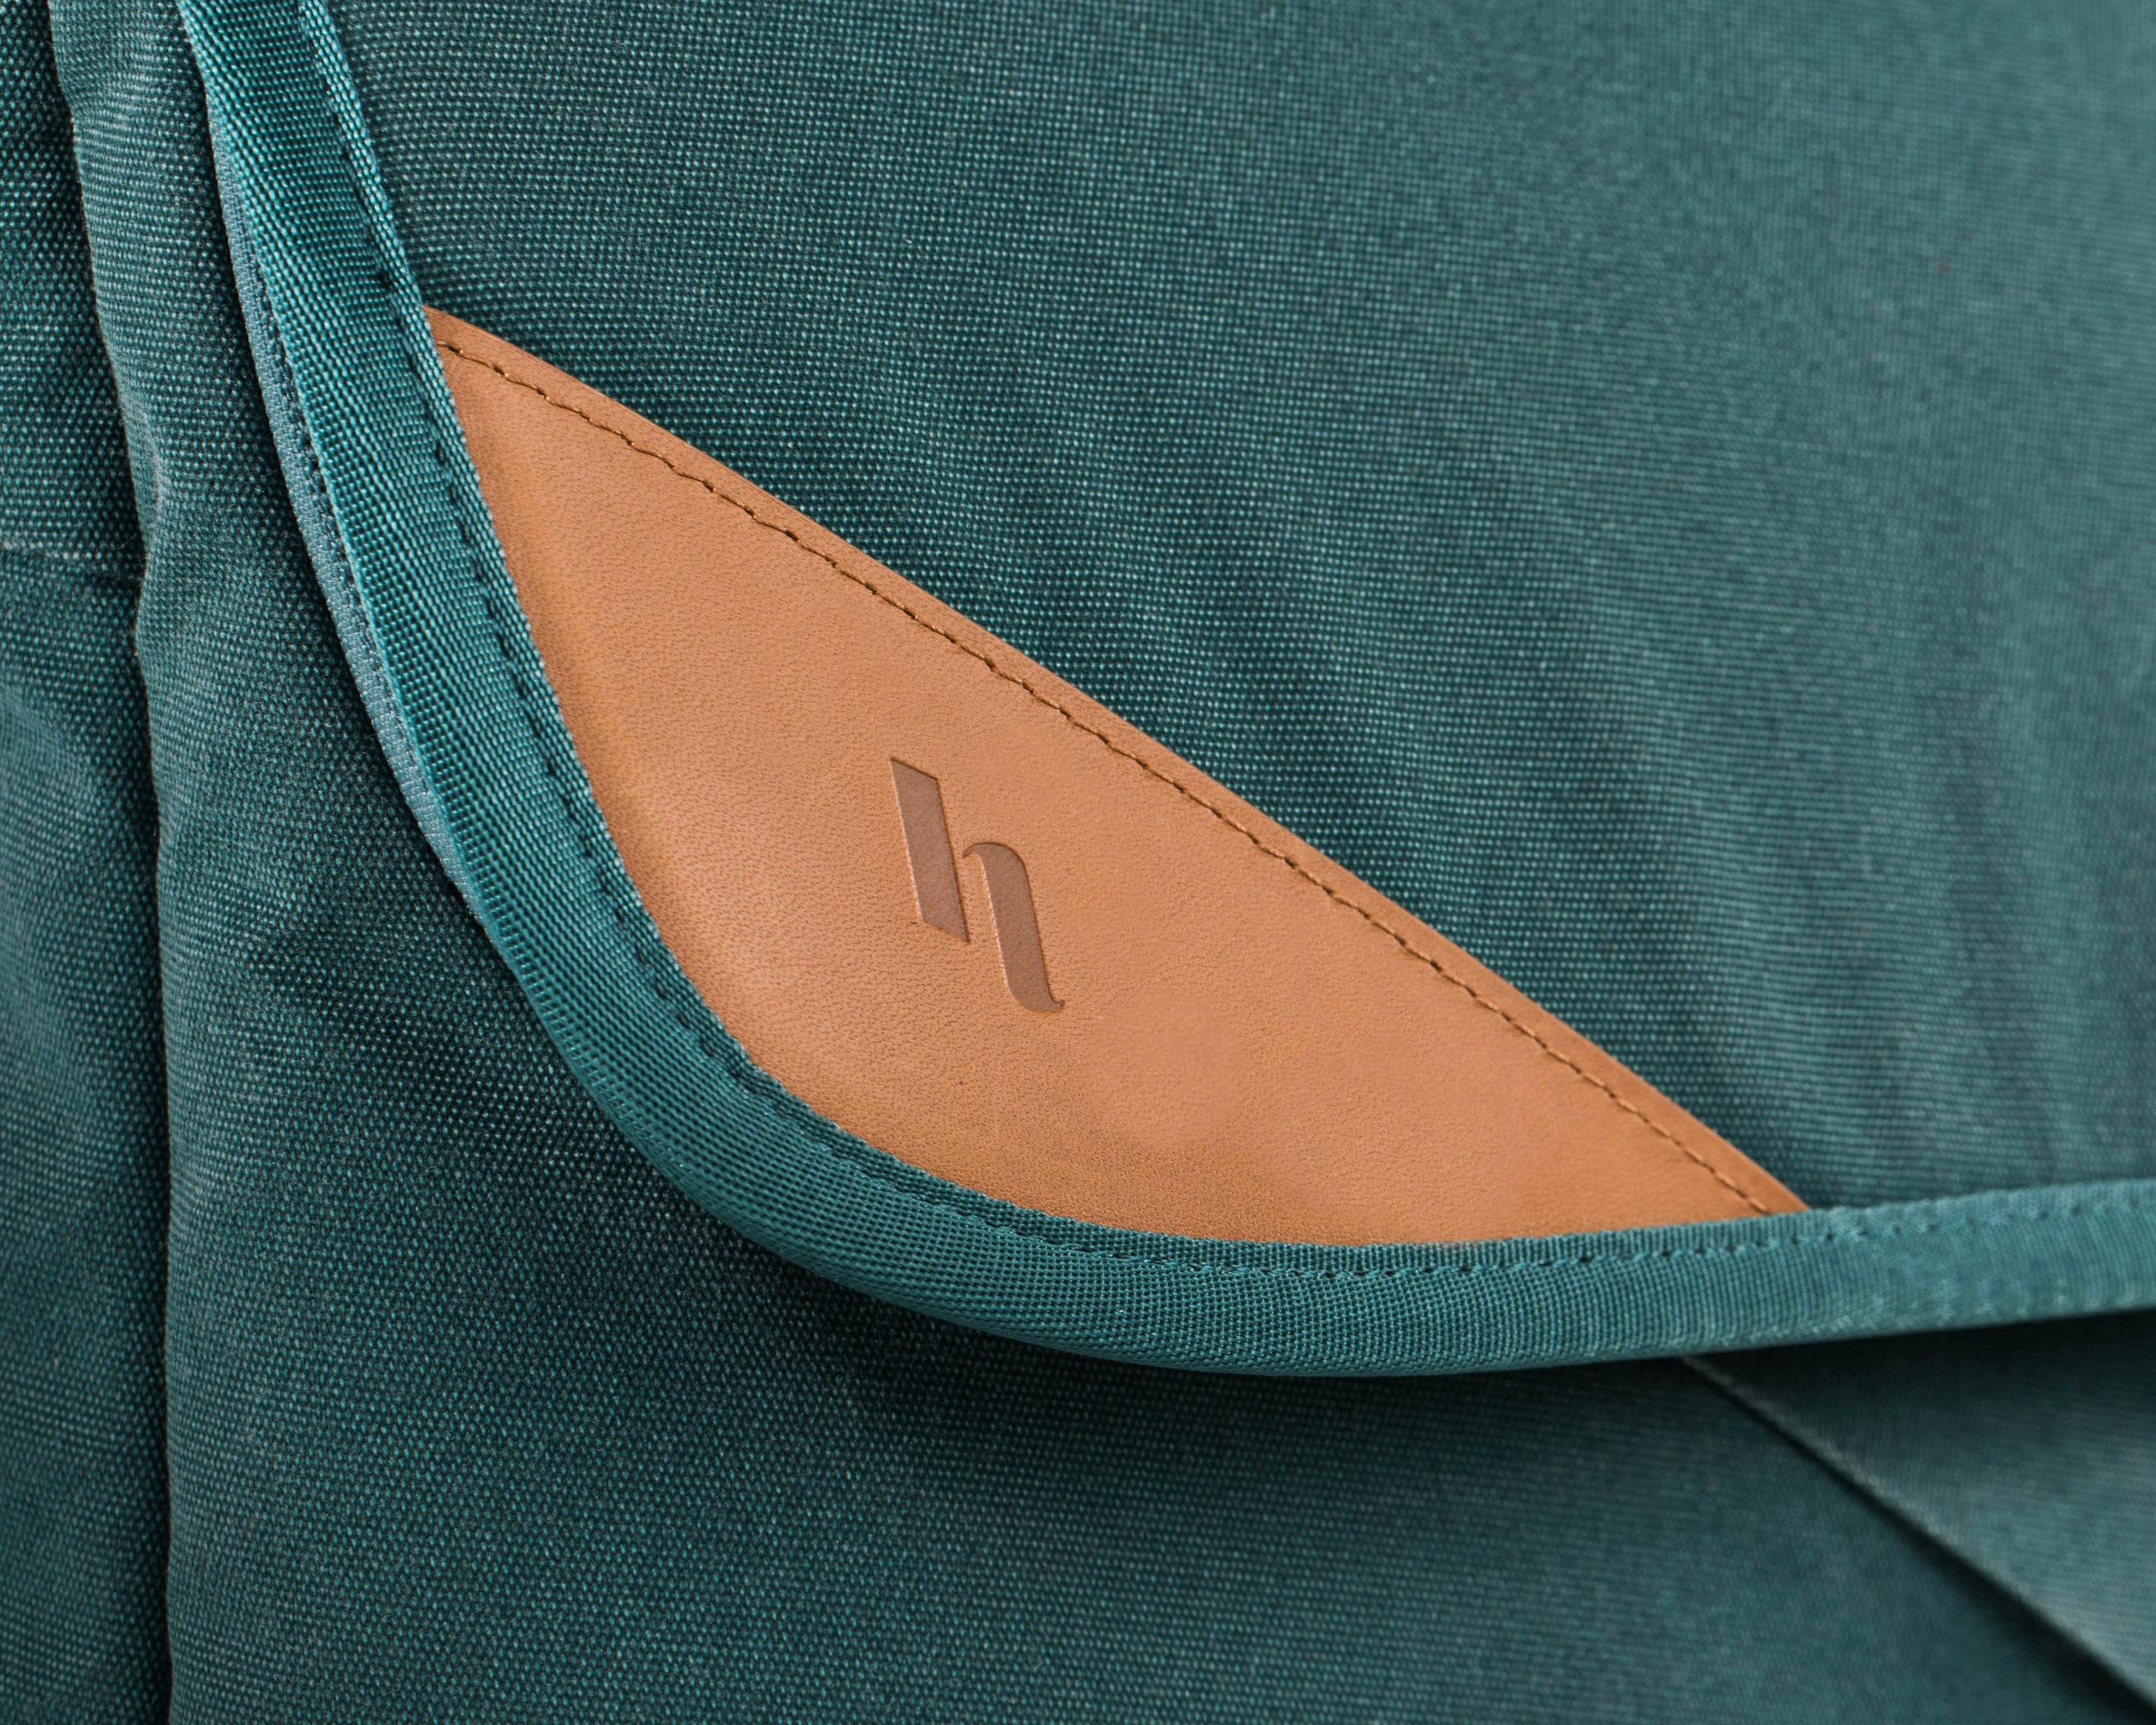 Holdland backpack green logo detail